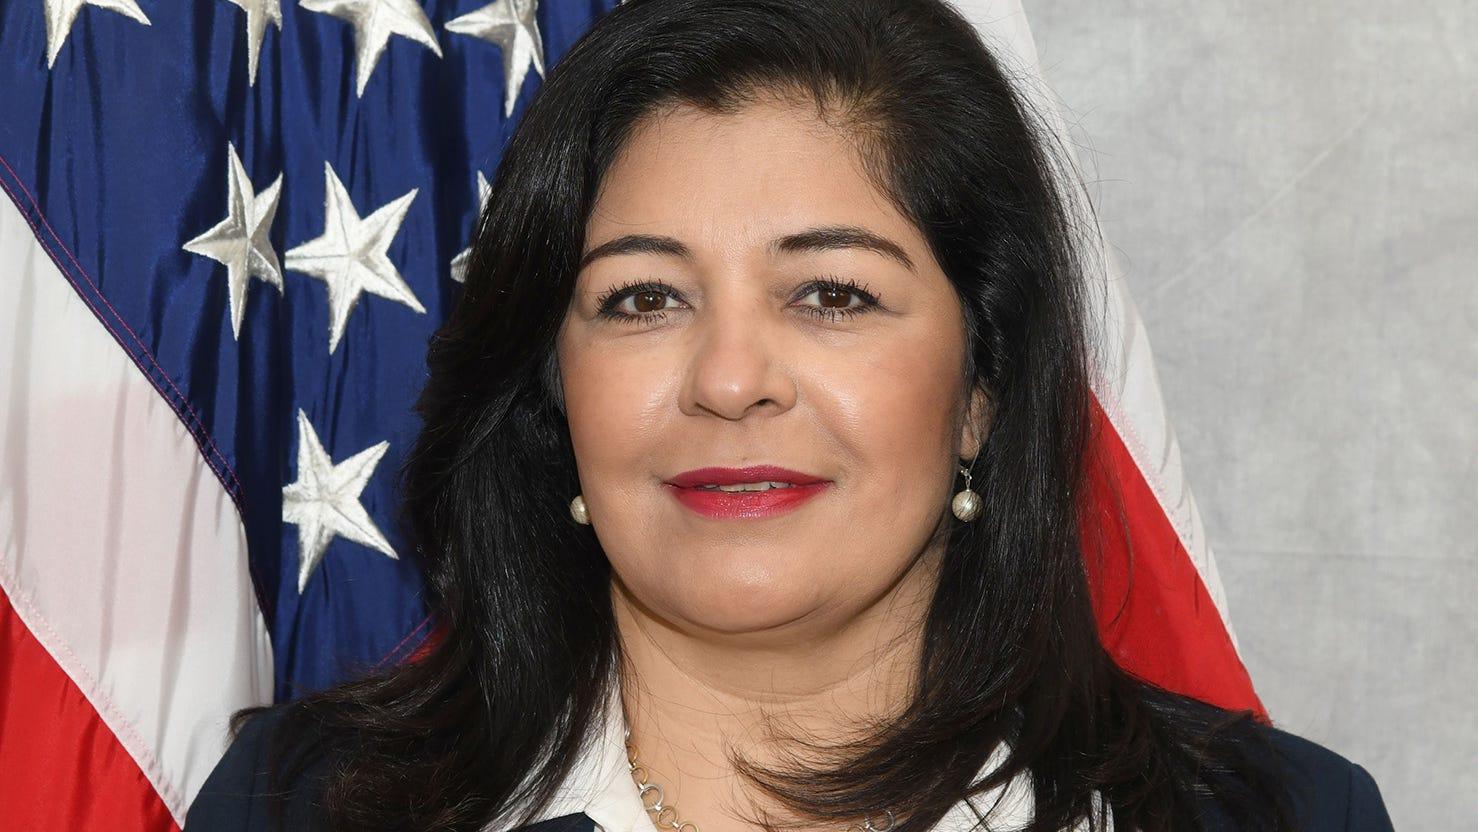 Pakistan-born Saima Mohsin becomes first federal Muslim woman prosecutor in US